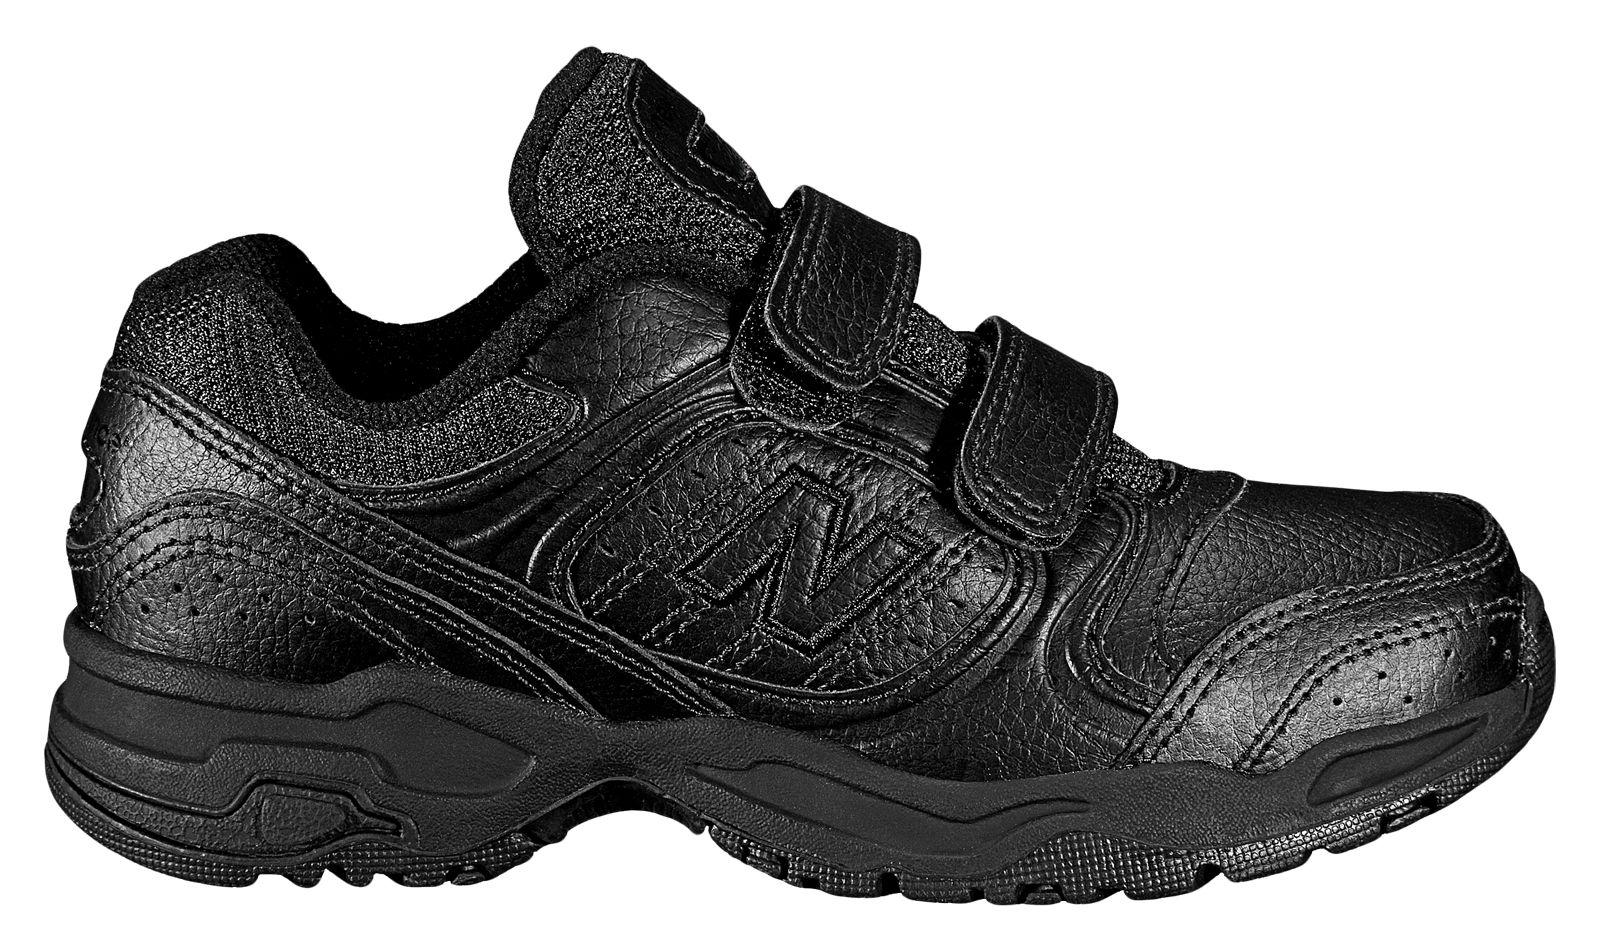 New Balance Kids 623 Shoes Black